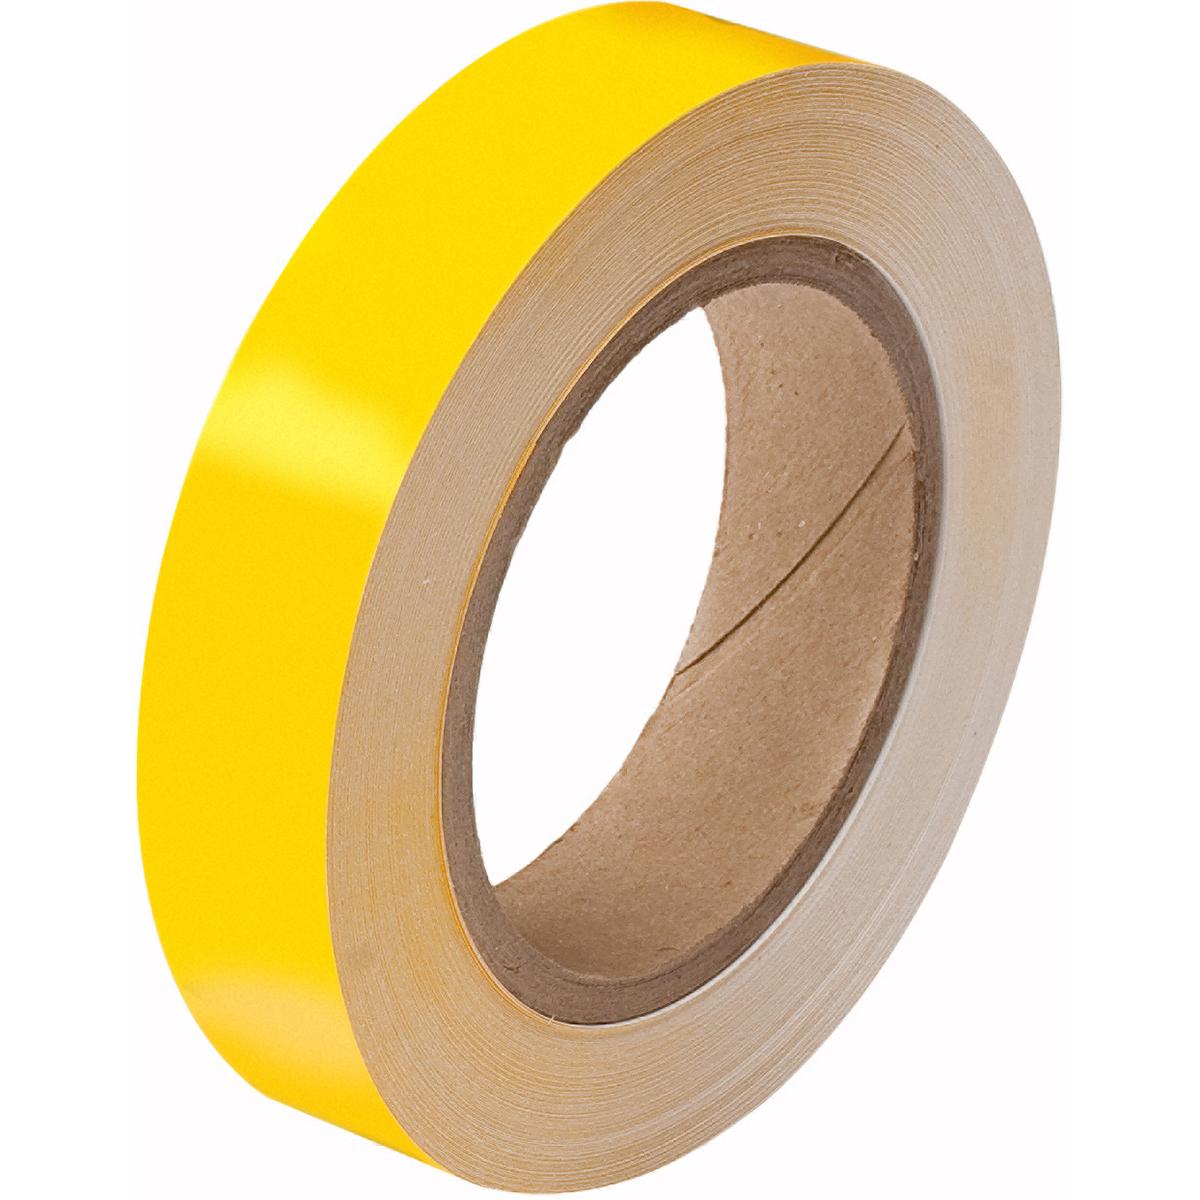 Pipe Banding Tape yellow 25 mm